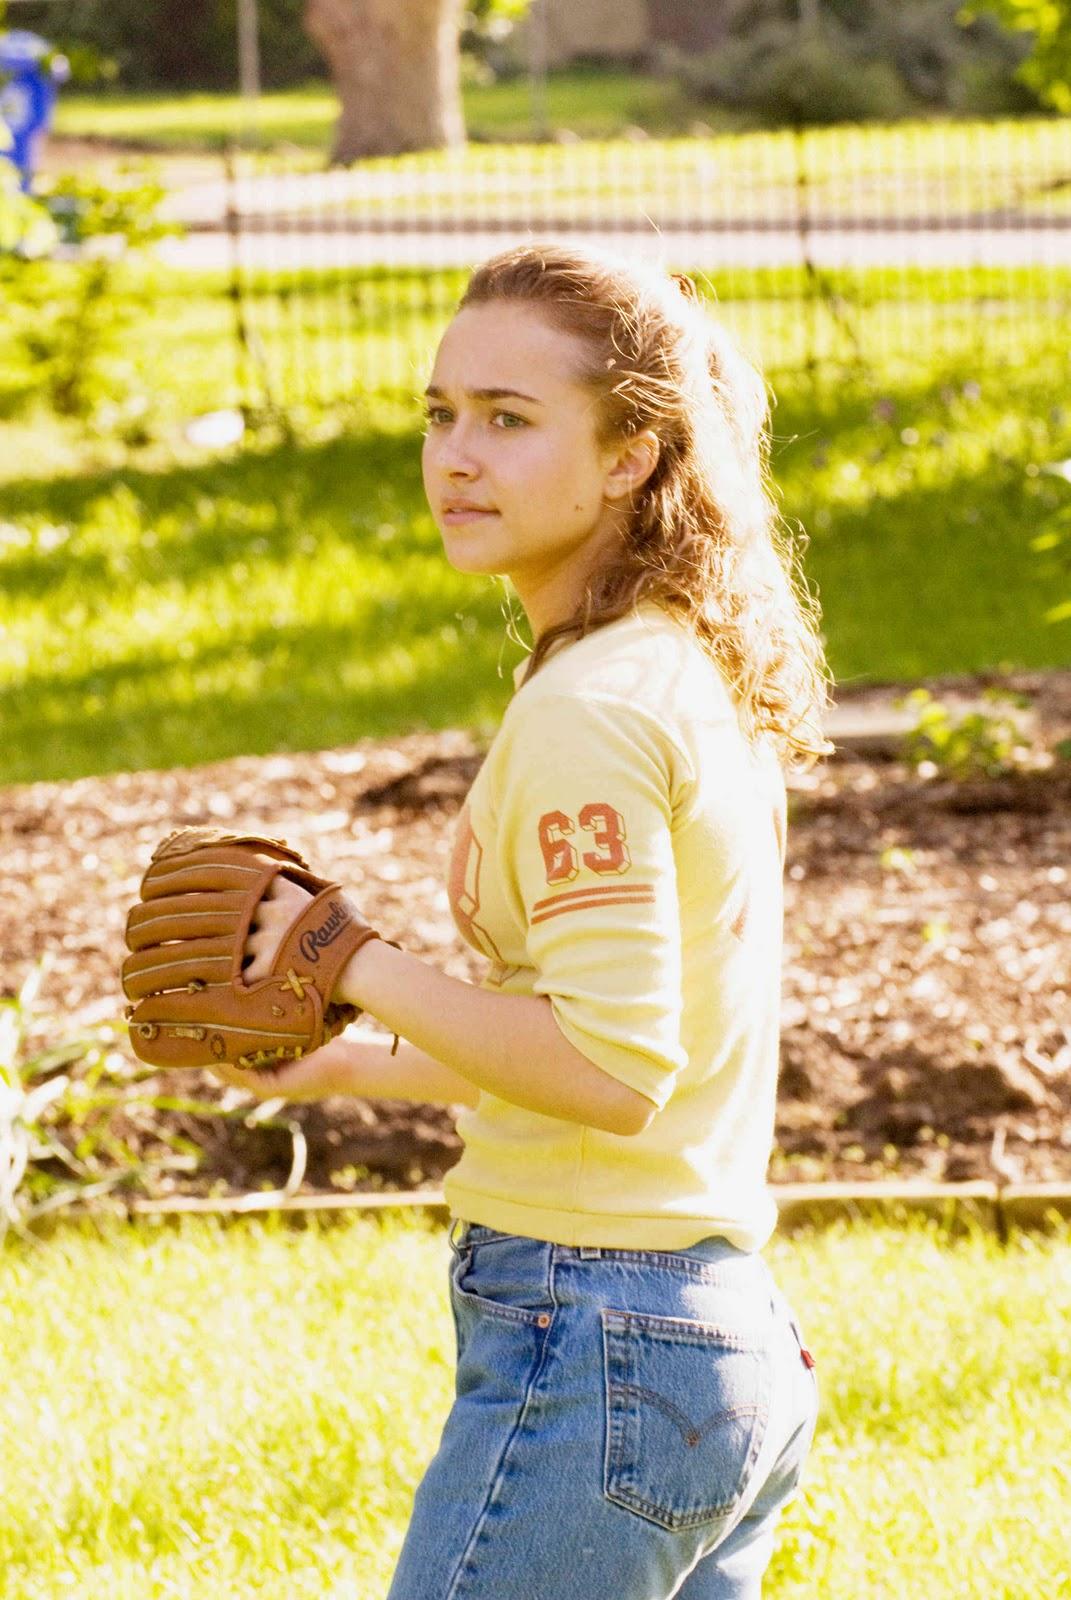 http://3.bp.blogspot.com/_YHubNjdqtIE/TIwzA2B6rVI/AAAAAAAAIjA/jEvze-v9bAQ/s1600/Hayden+Panettiere+baseball.jpg